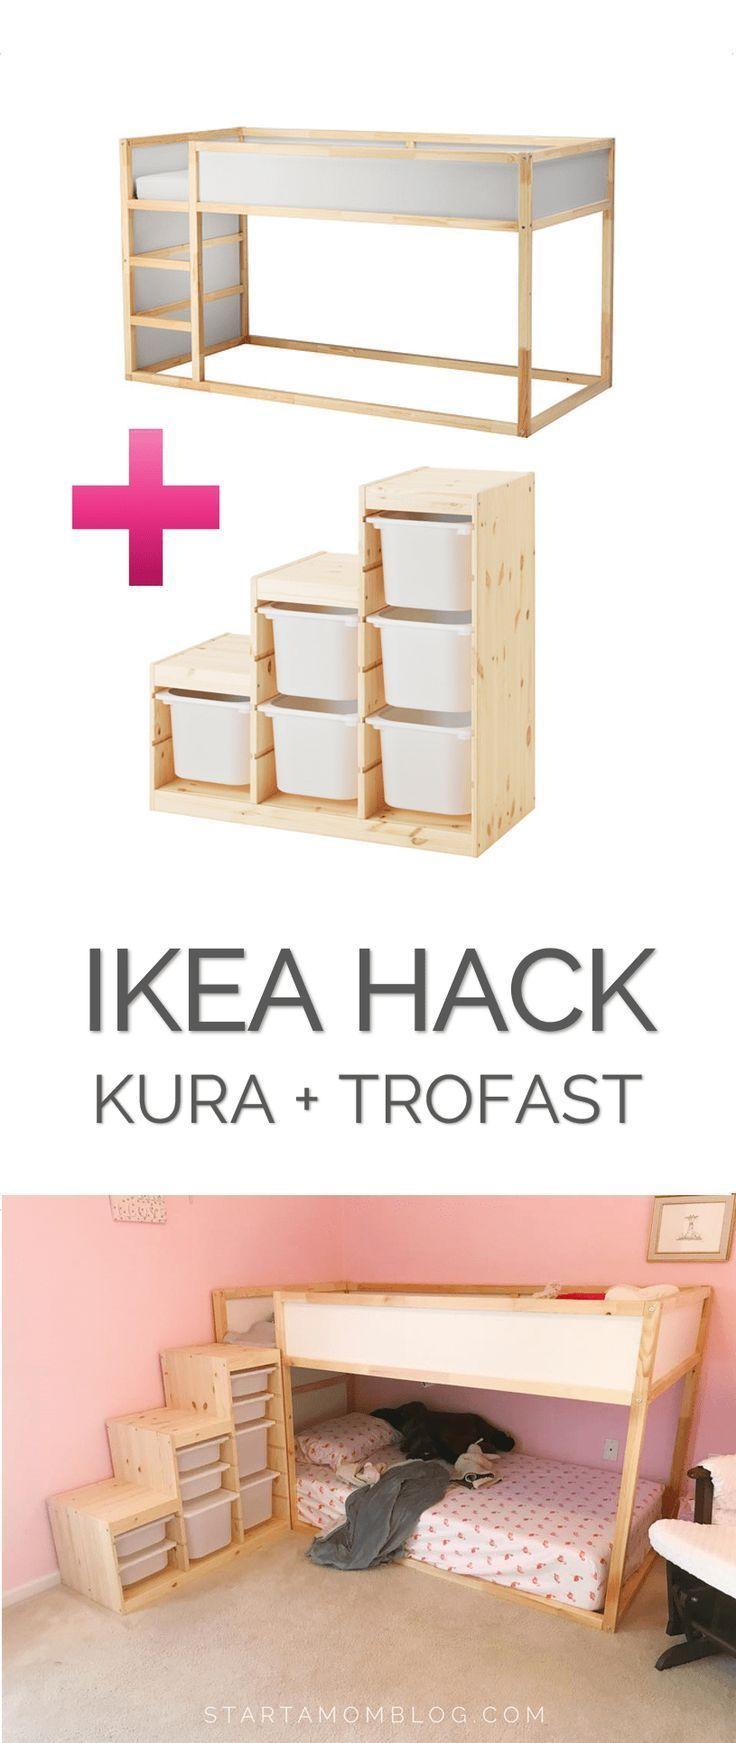 Ikea Hack for a Toddler Bunk bed KURA plus TROFAST